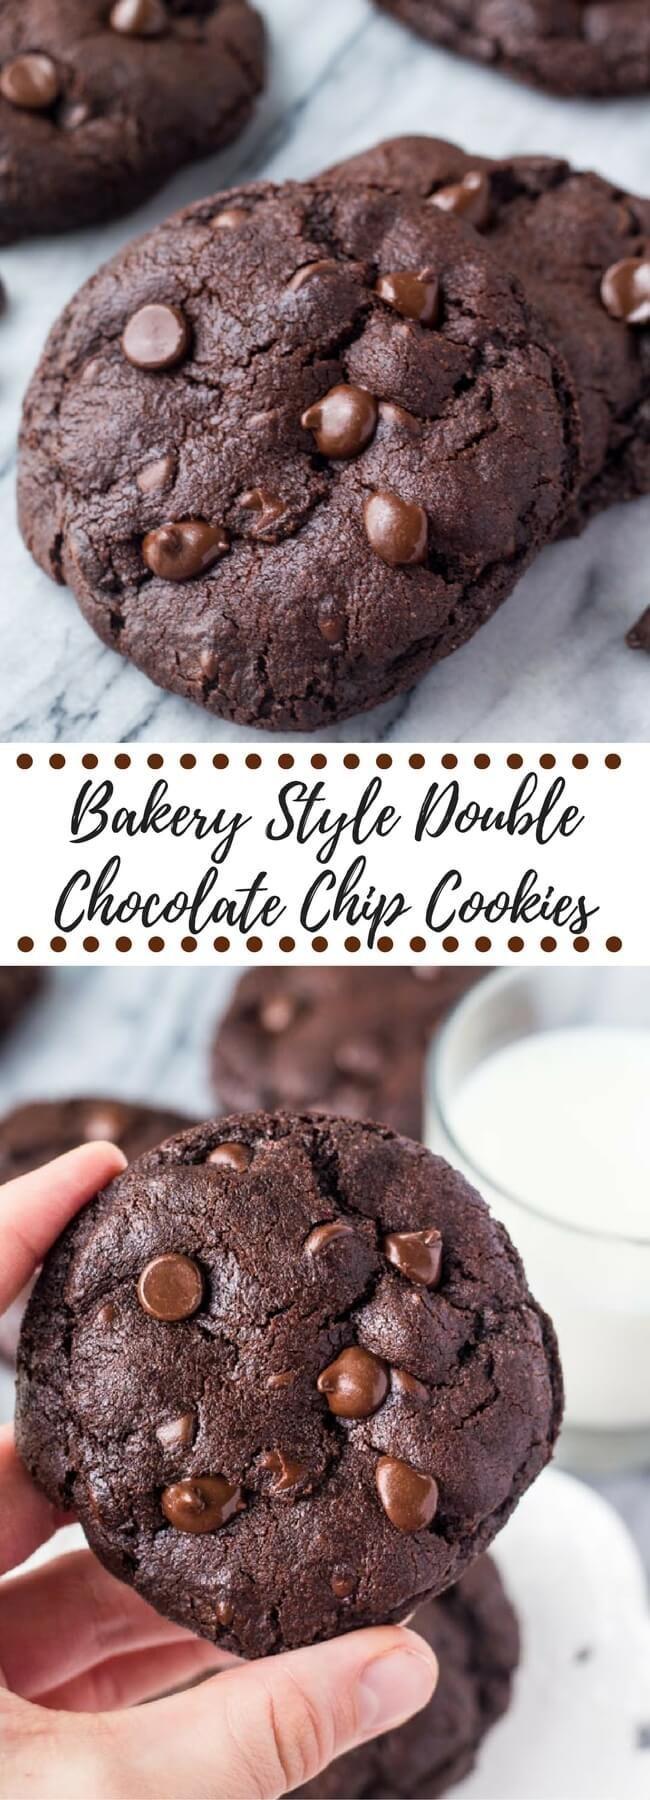 Bakery Style Double Chocolate Chip Cookies | Receta | Galleta ...